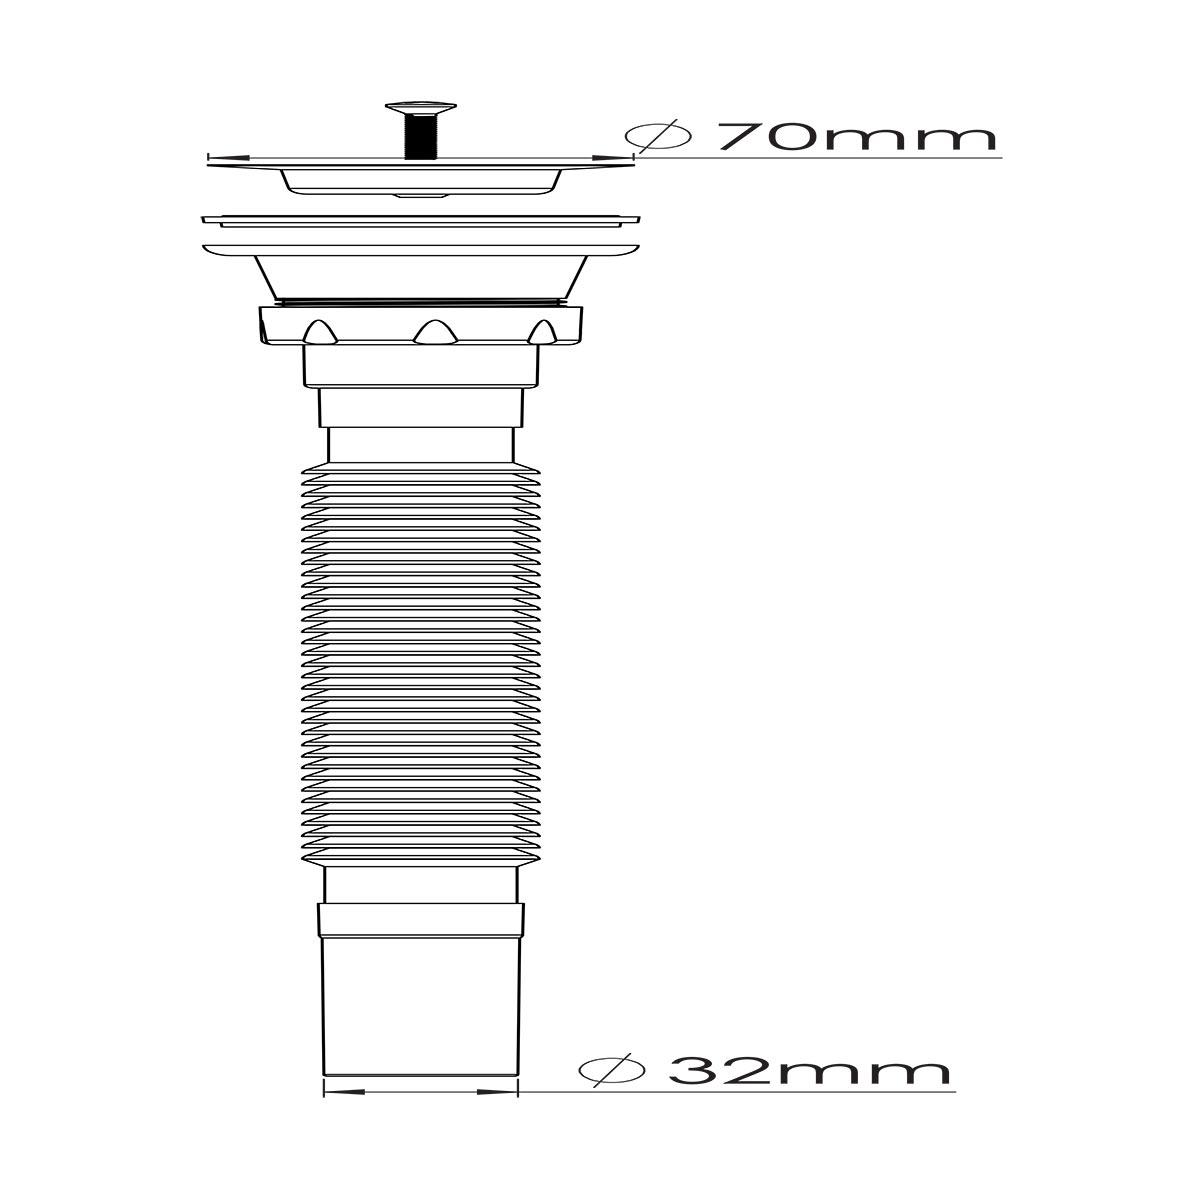 1 ½ – Ø32, 304 Kalite Paslanmaz Vida ve 70 mm Süzgeç